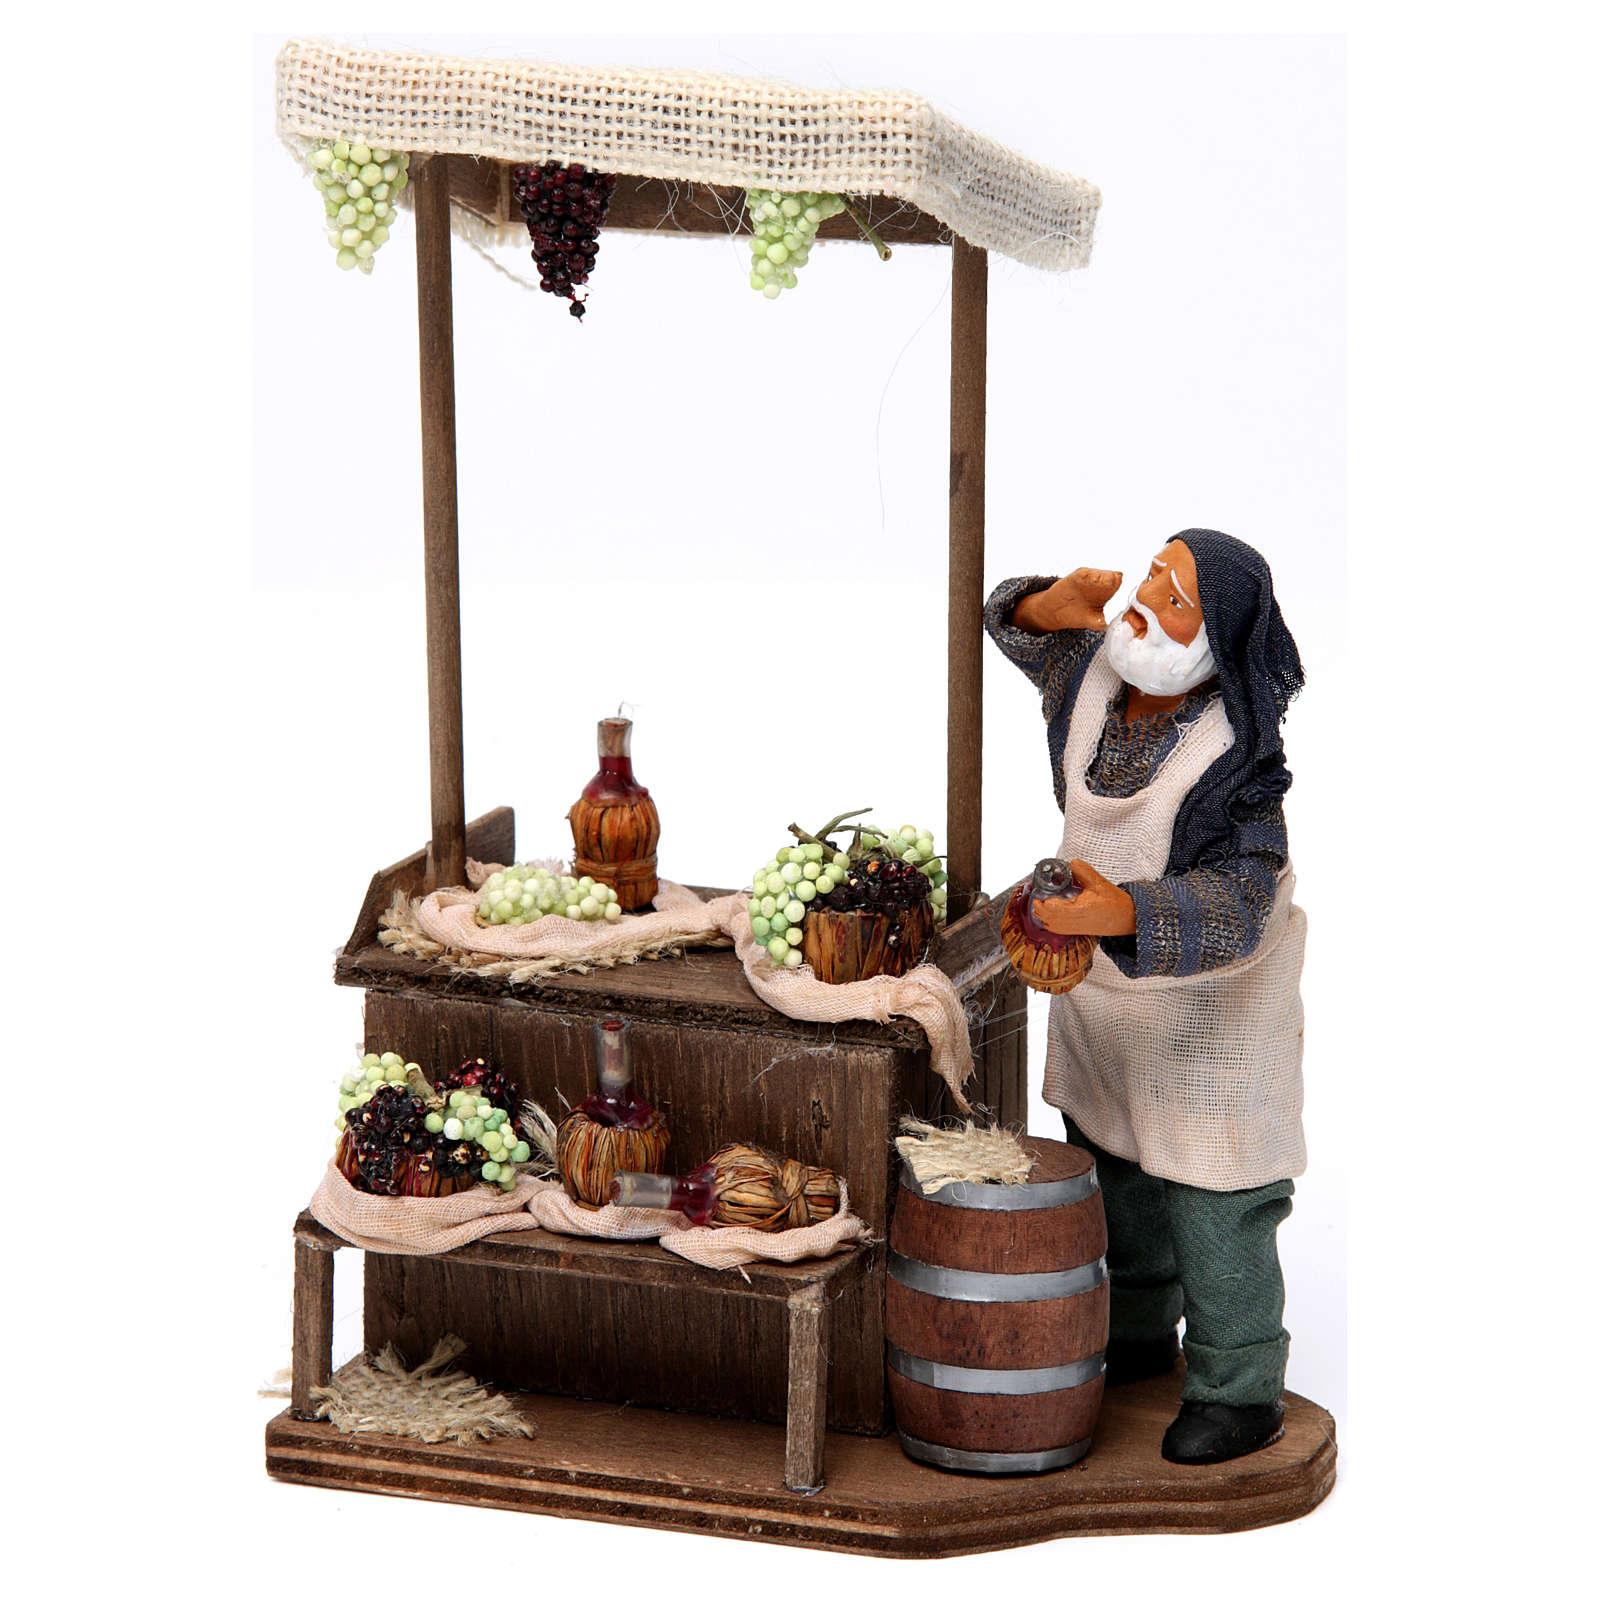 Venditore uva e vino terracotta per presepe Napoletano 12 cm 4